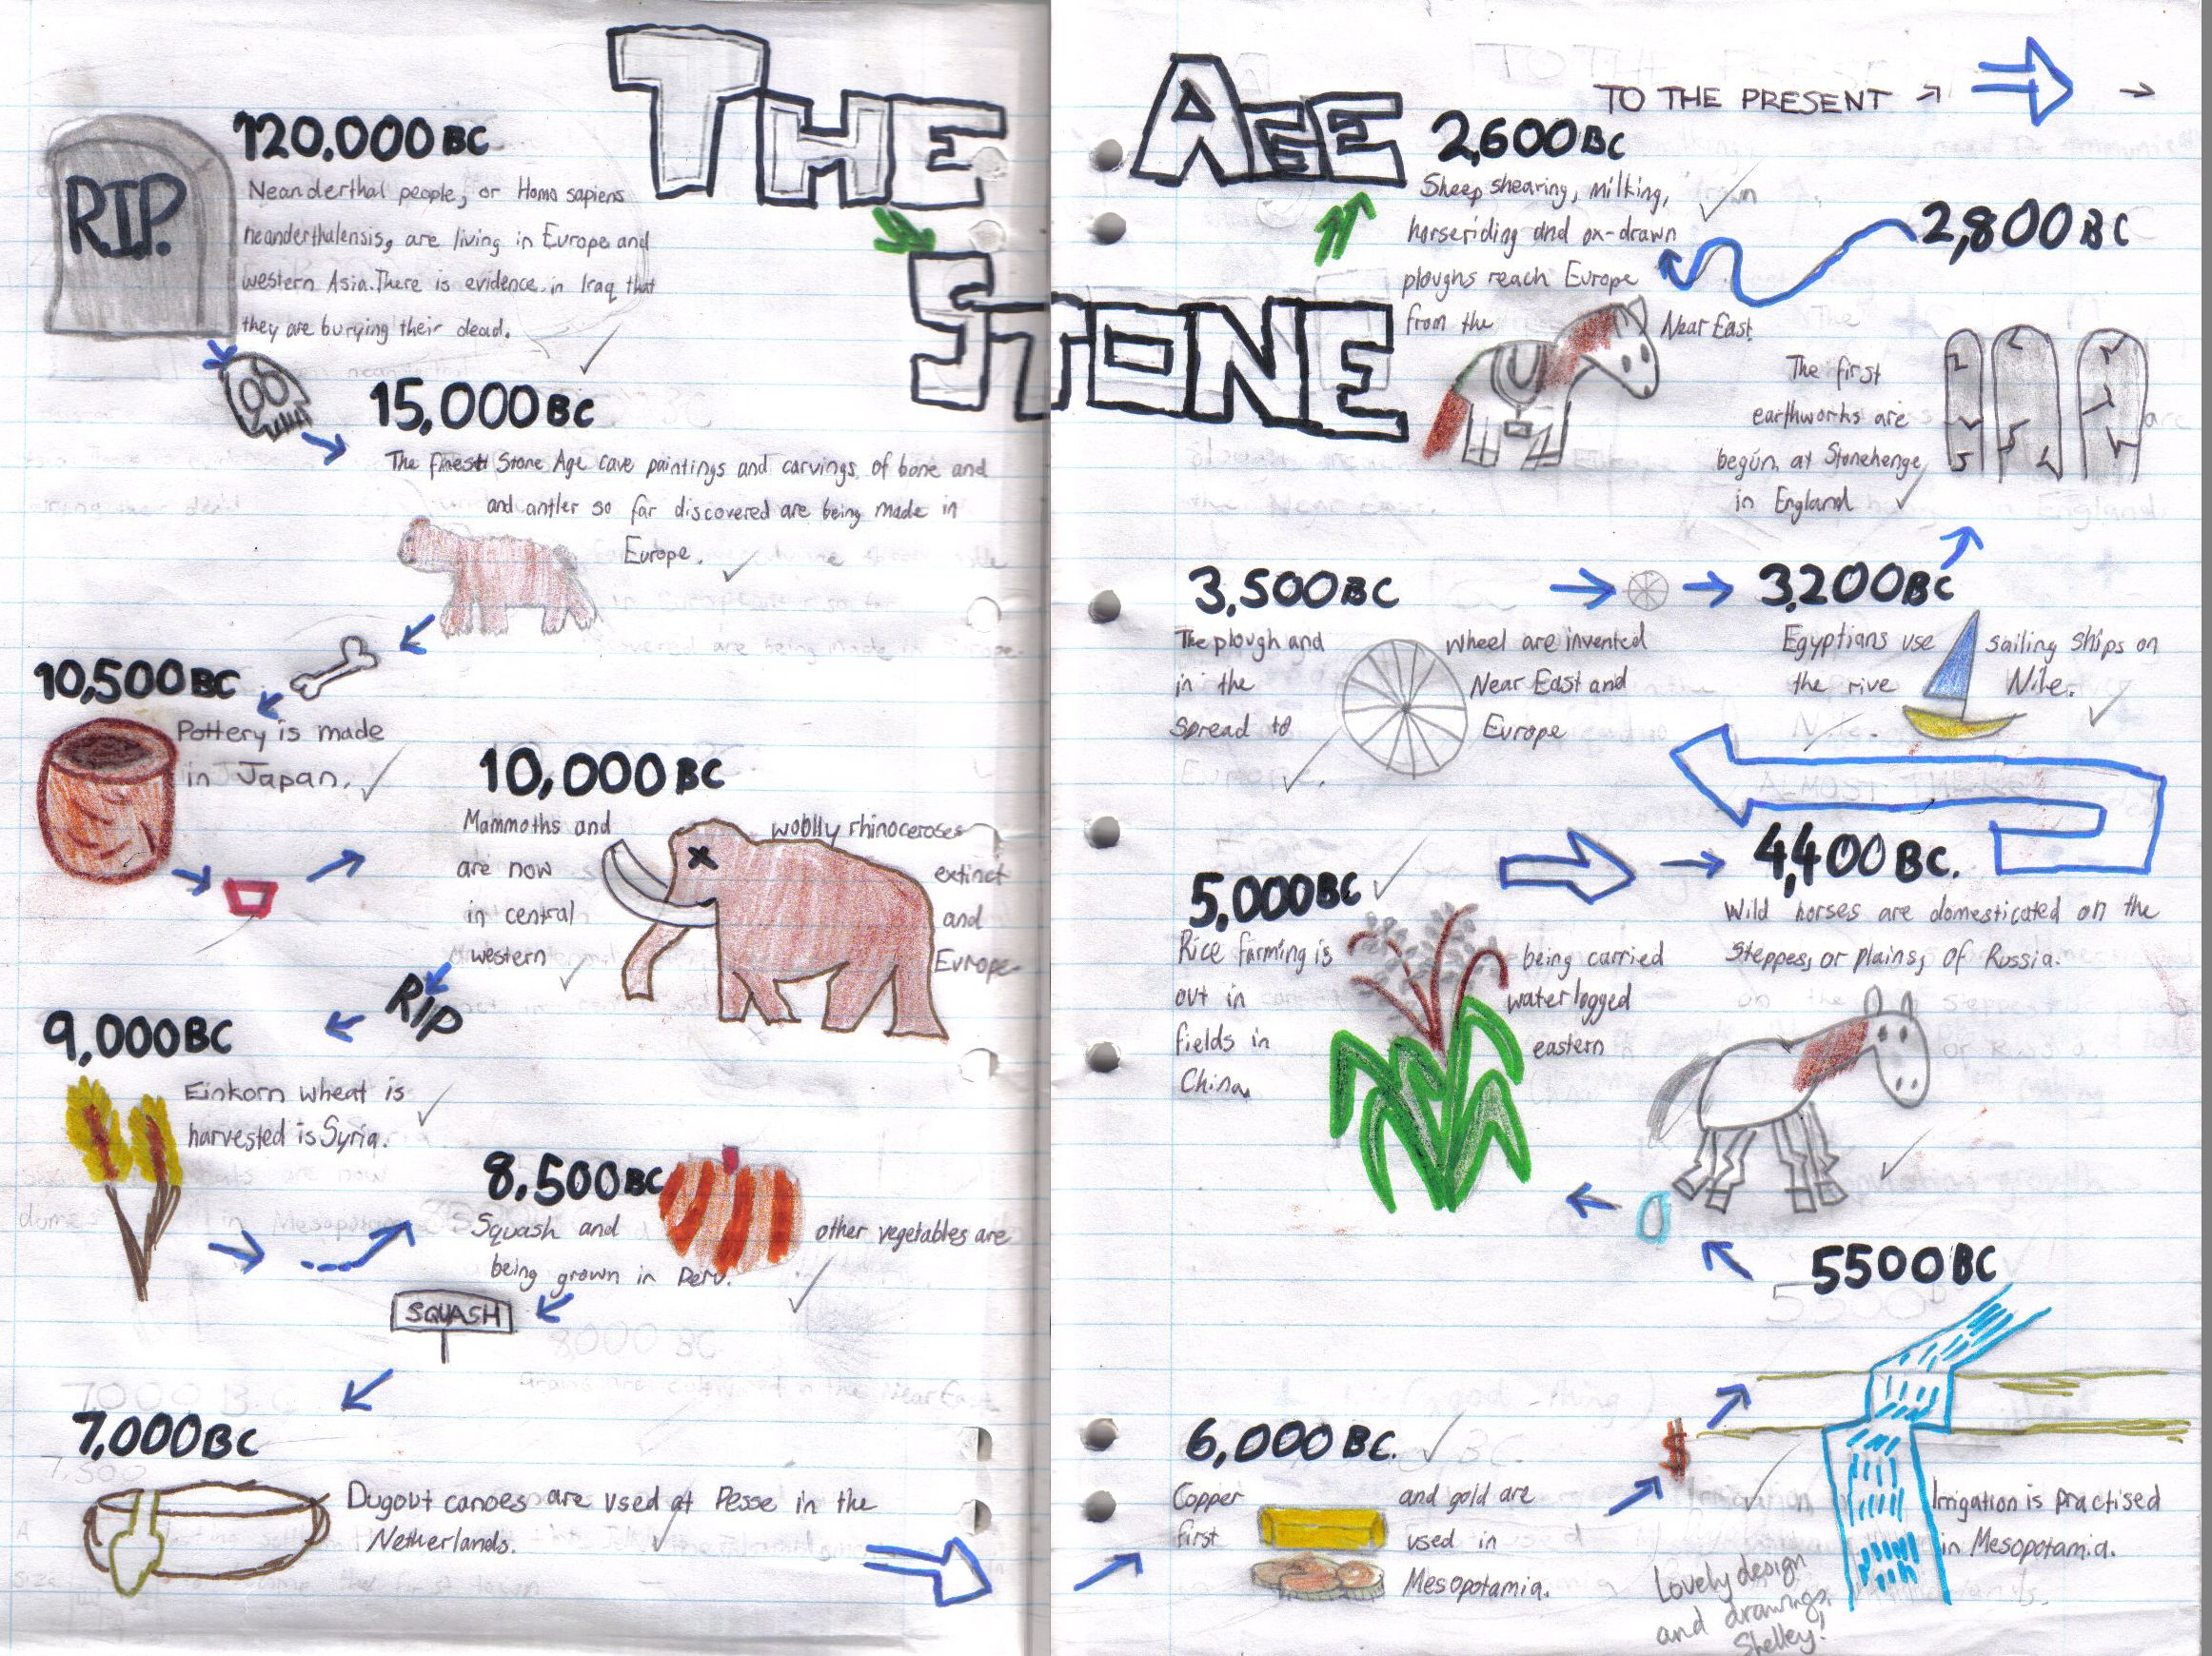 Shelley X Timeline Stone Age  Copy  HistoryTimelines